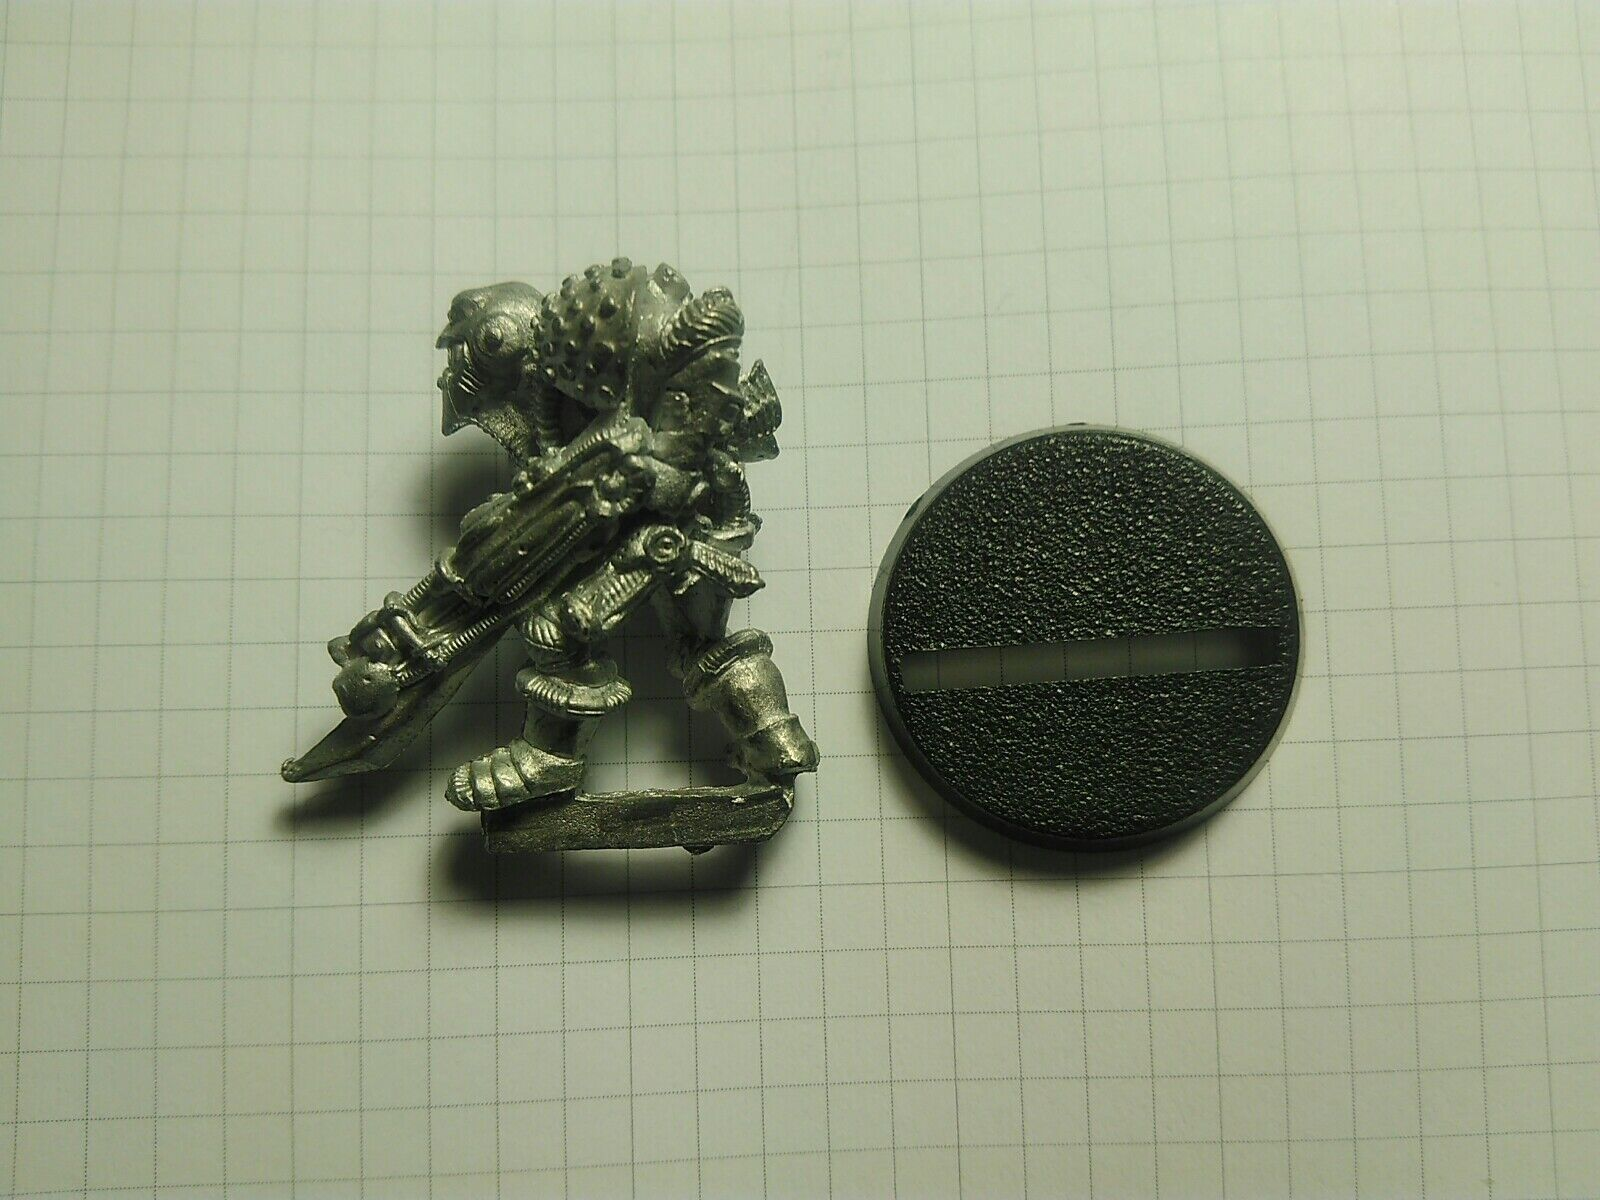 Citadel - LE2 Imperial Marine Warhammer 40,000 rogue trader limited edition